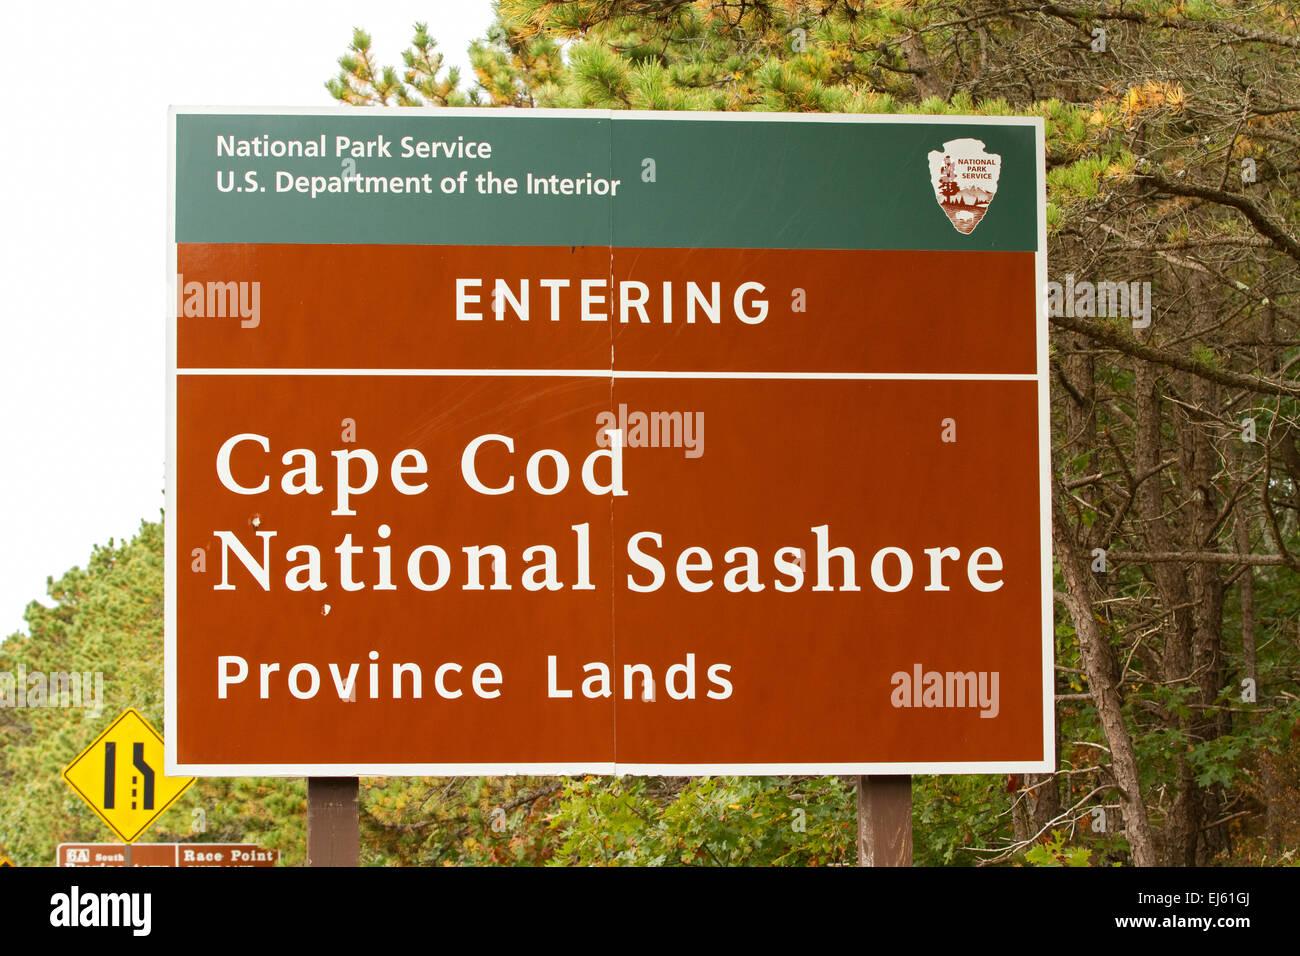 Cape Cod National Seashore National Park sign. - Stock Image